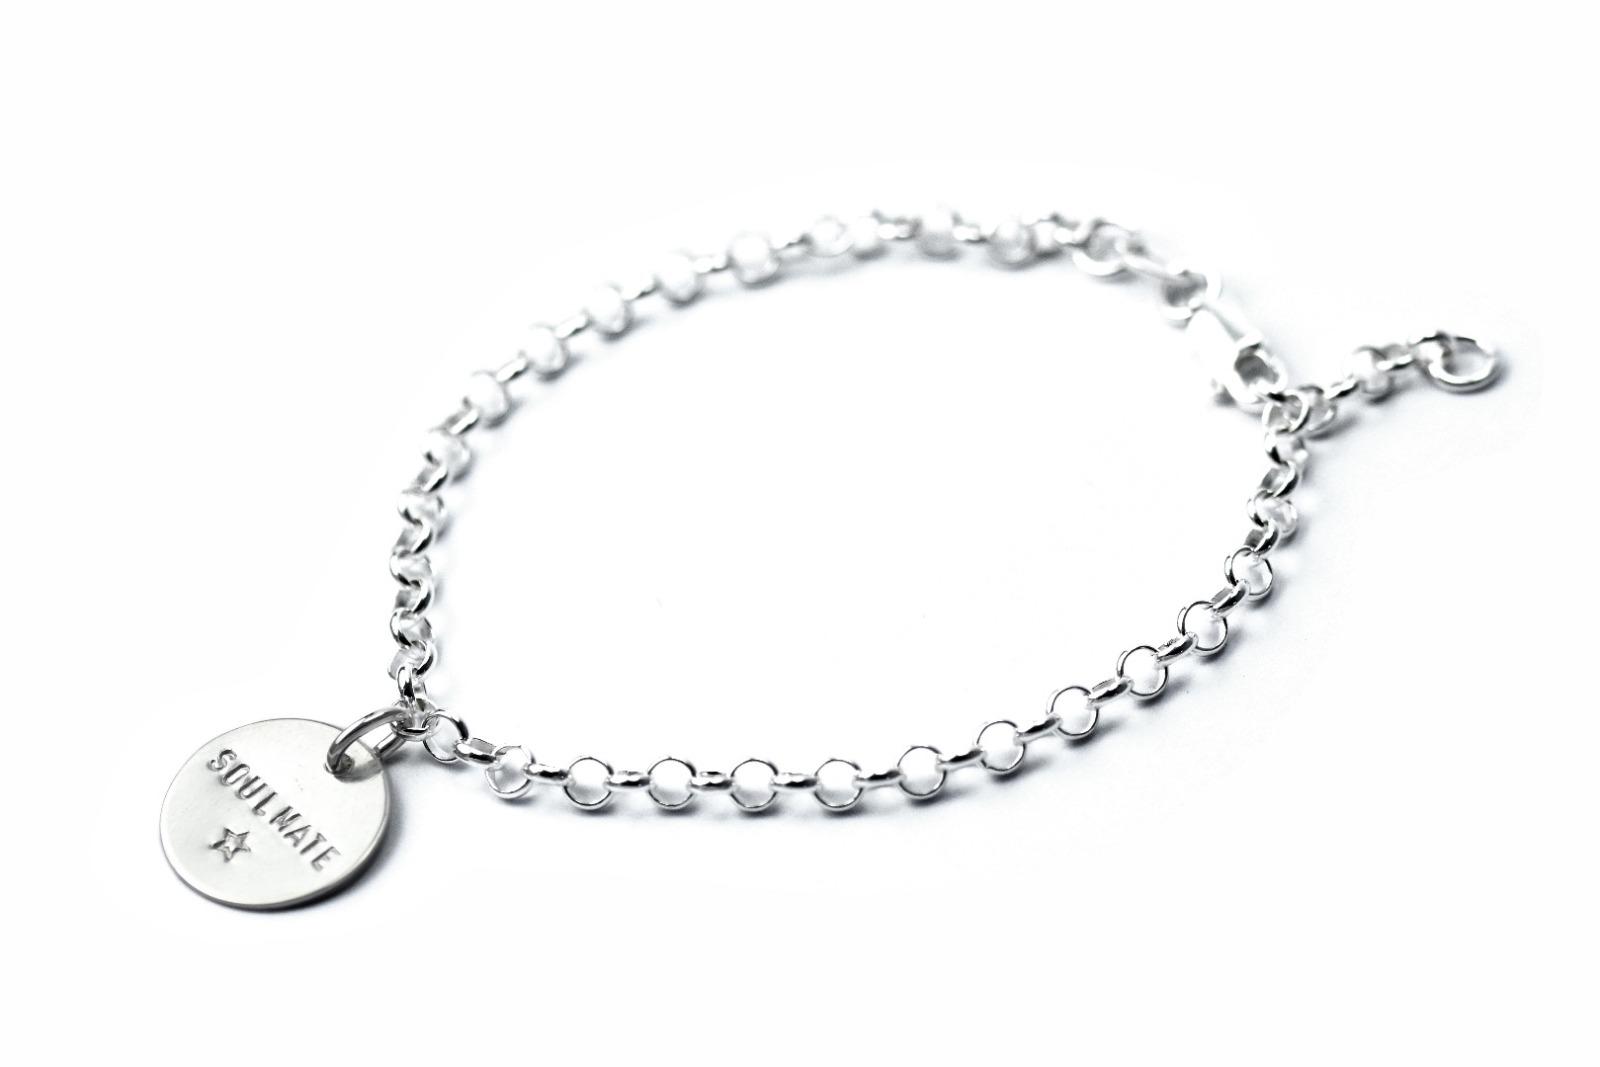 Silberarmband - Namens-, Geburts-, Spruchband - 1